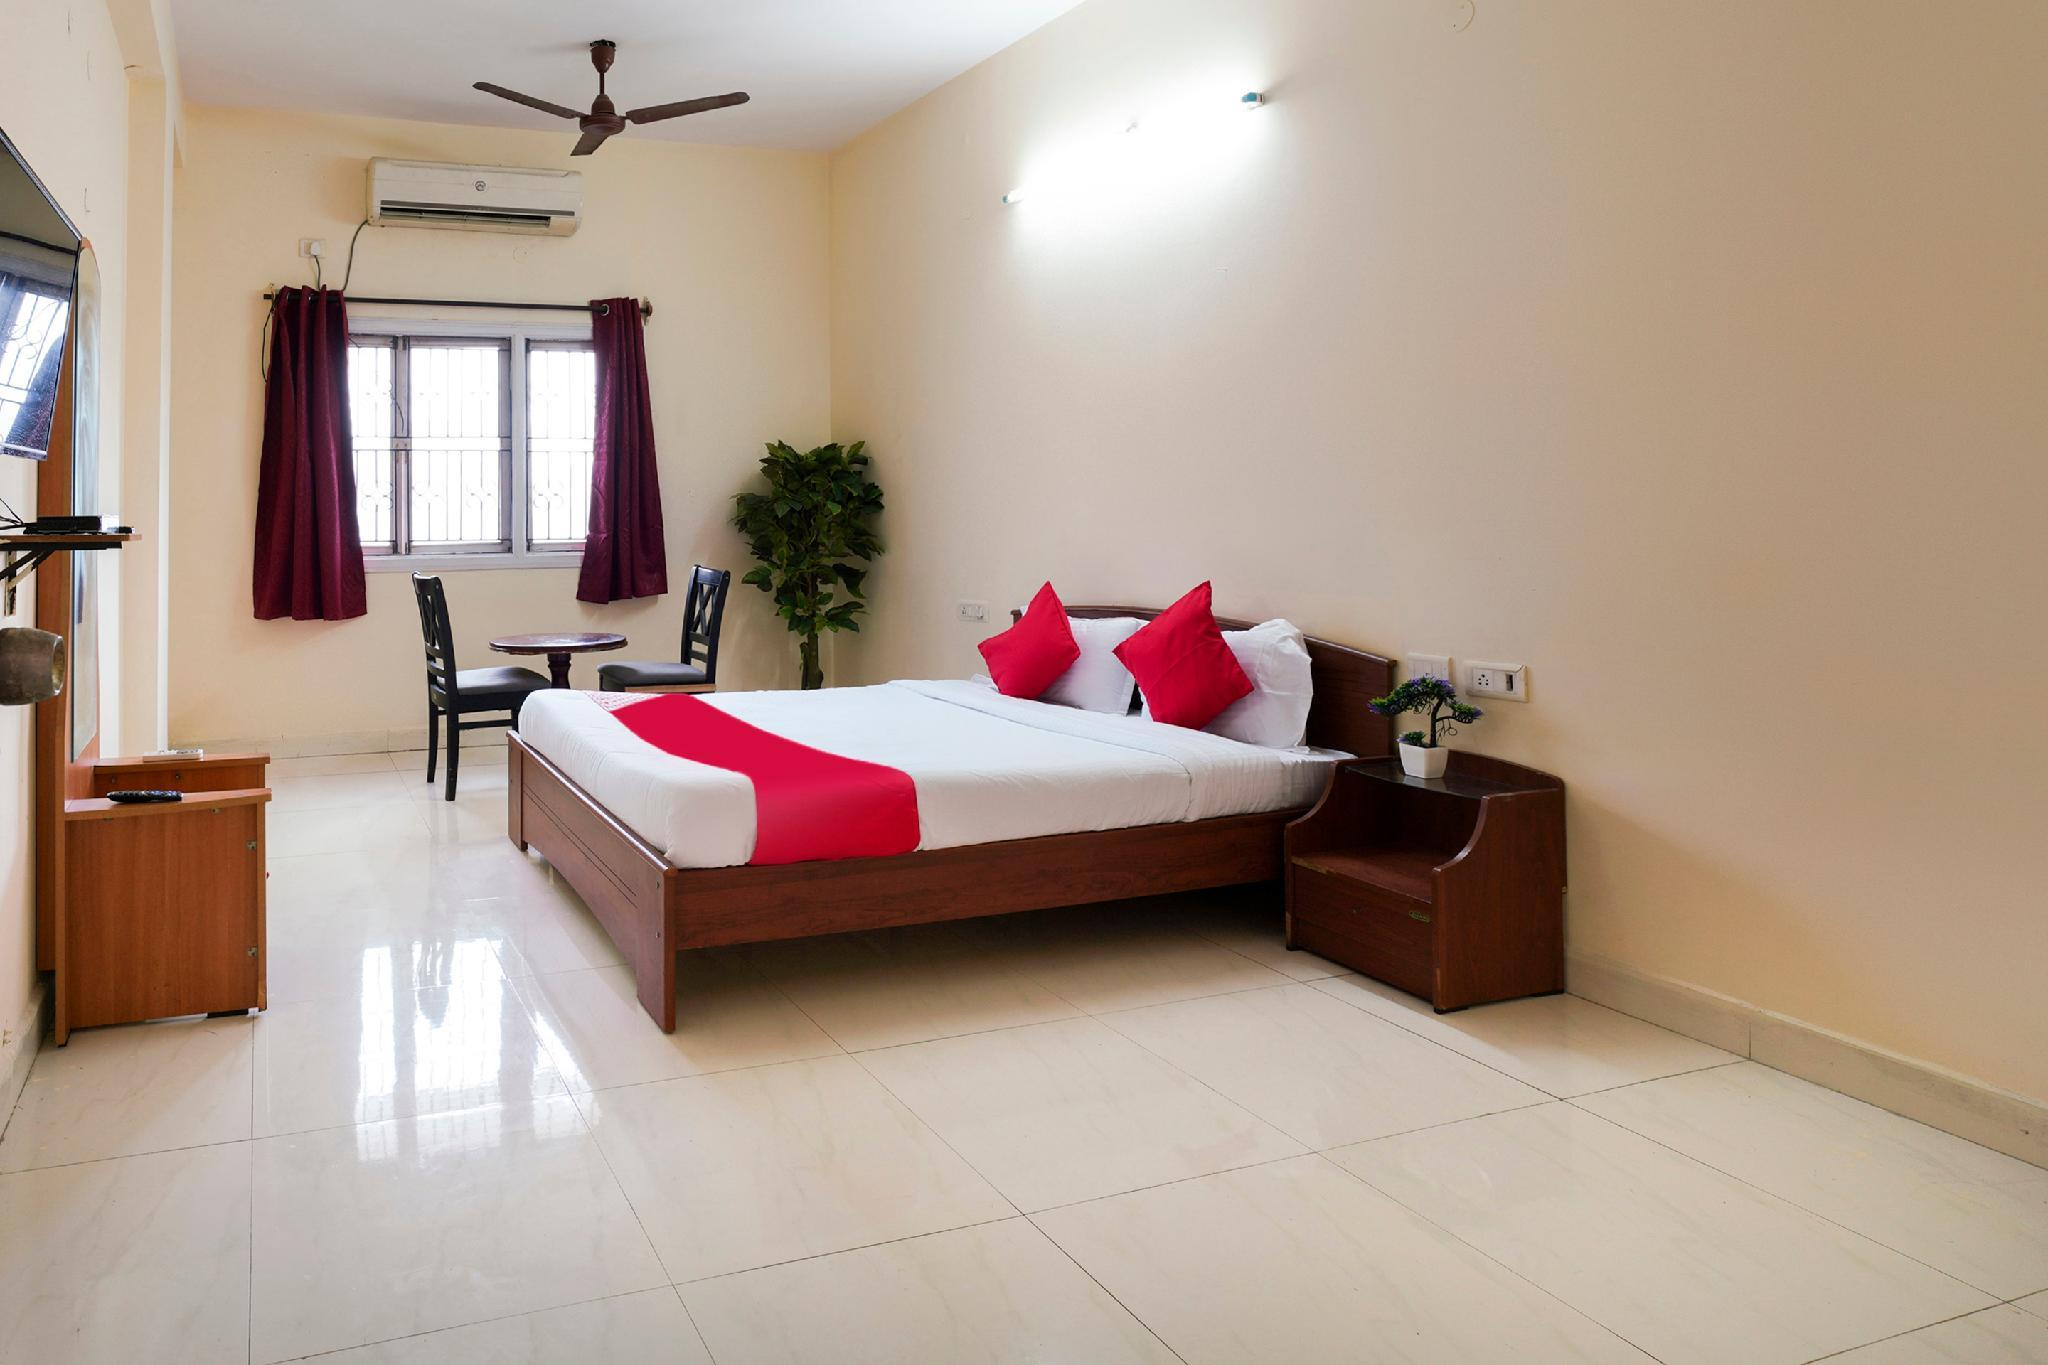 OYO 47614 New Property Banjara   Nbt Nagar